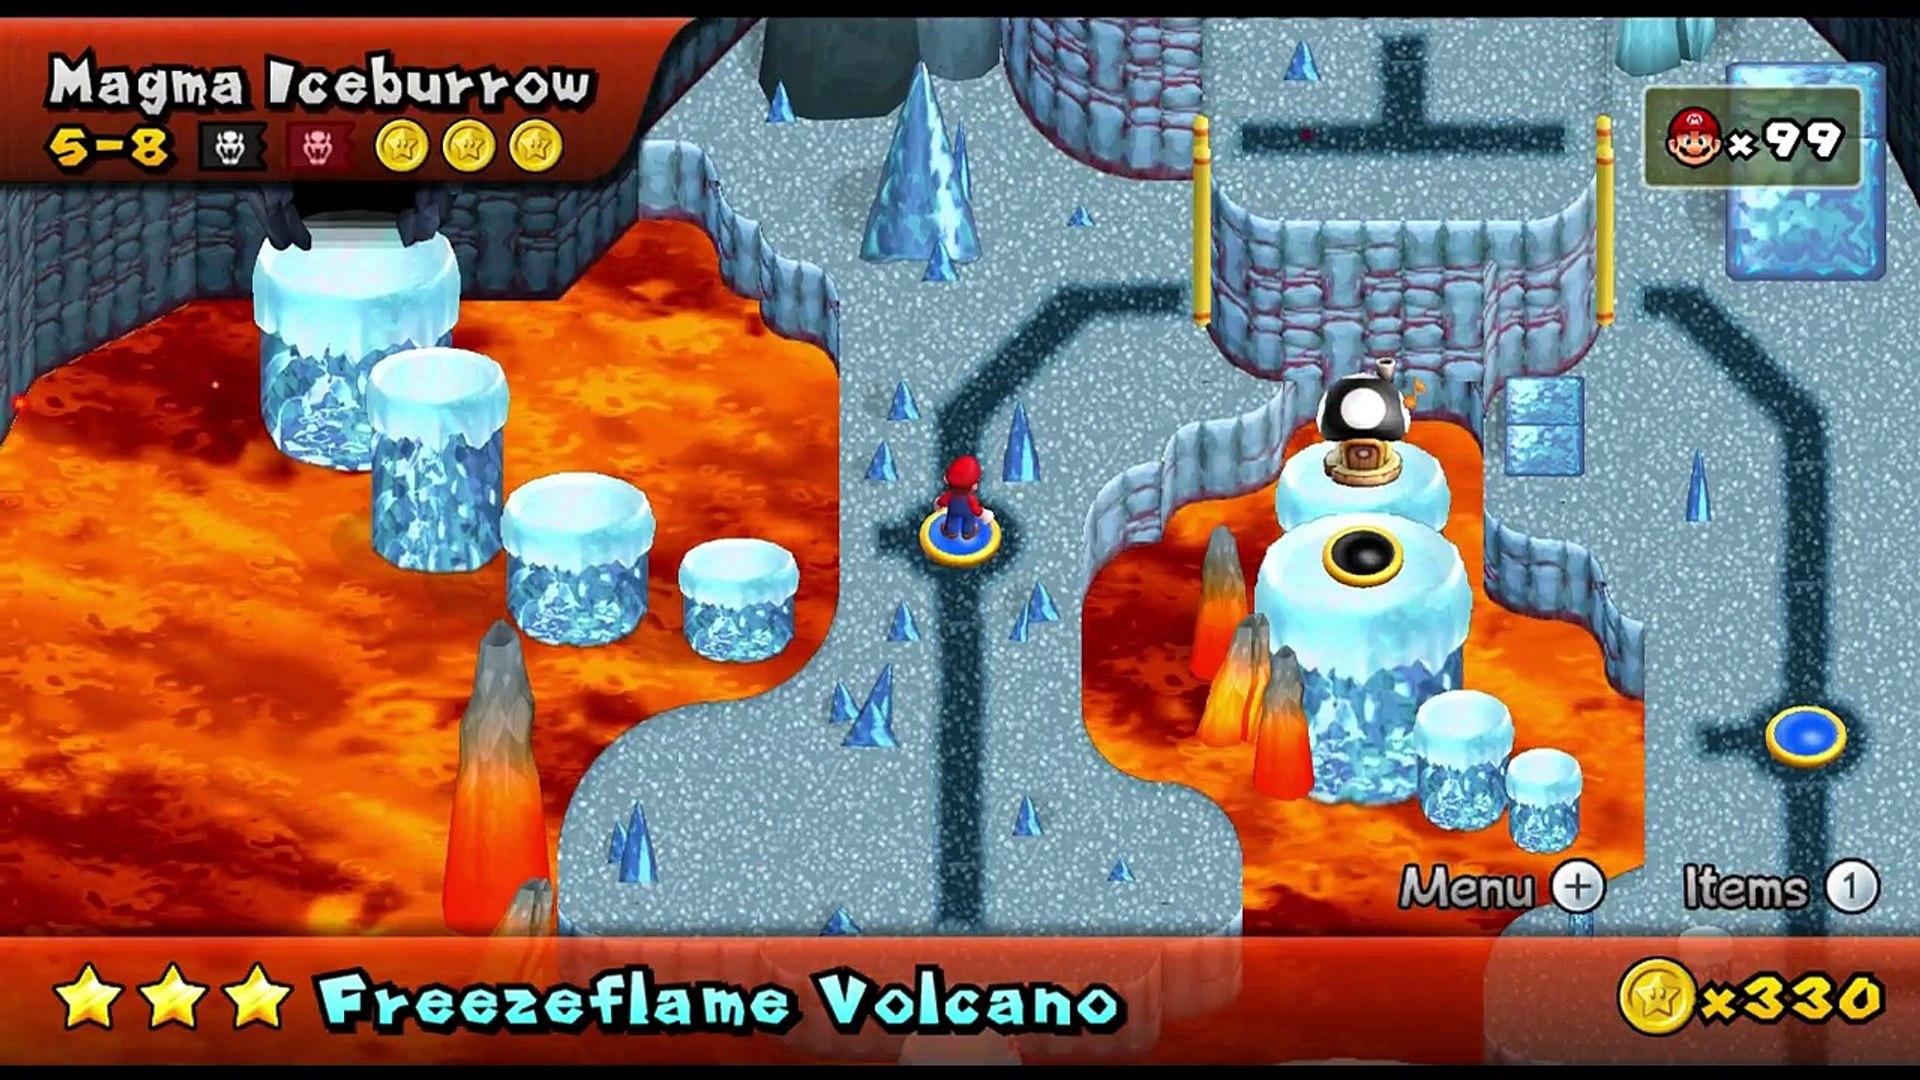 3D Games: RE: New Super Mario Bros. Wii (Wii)